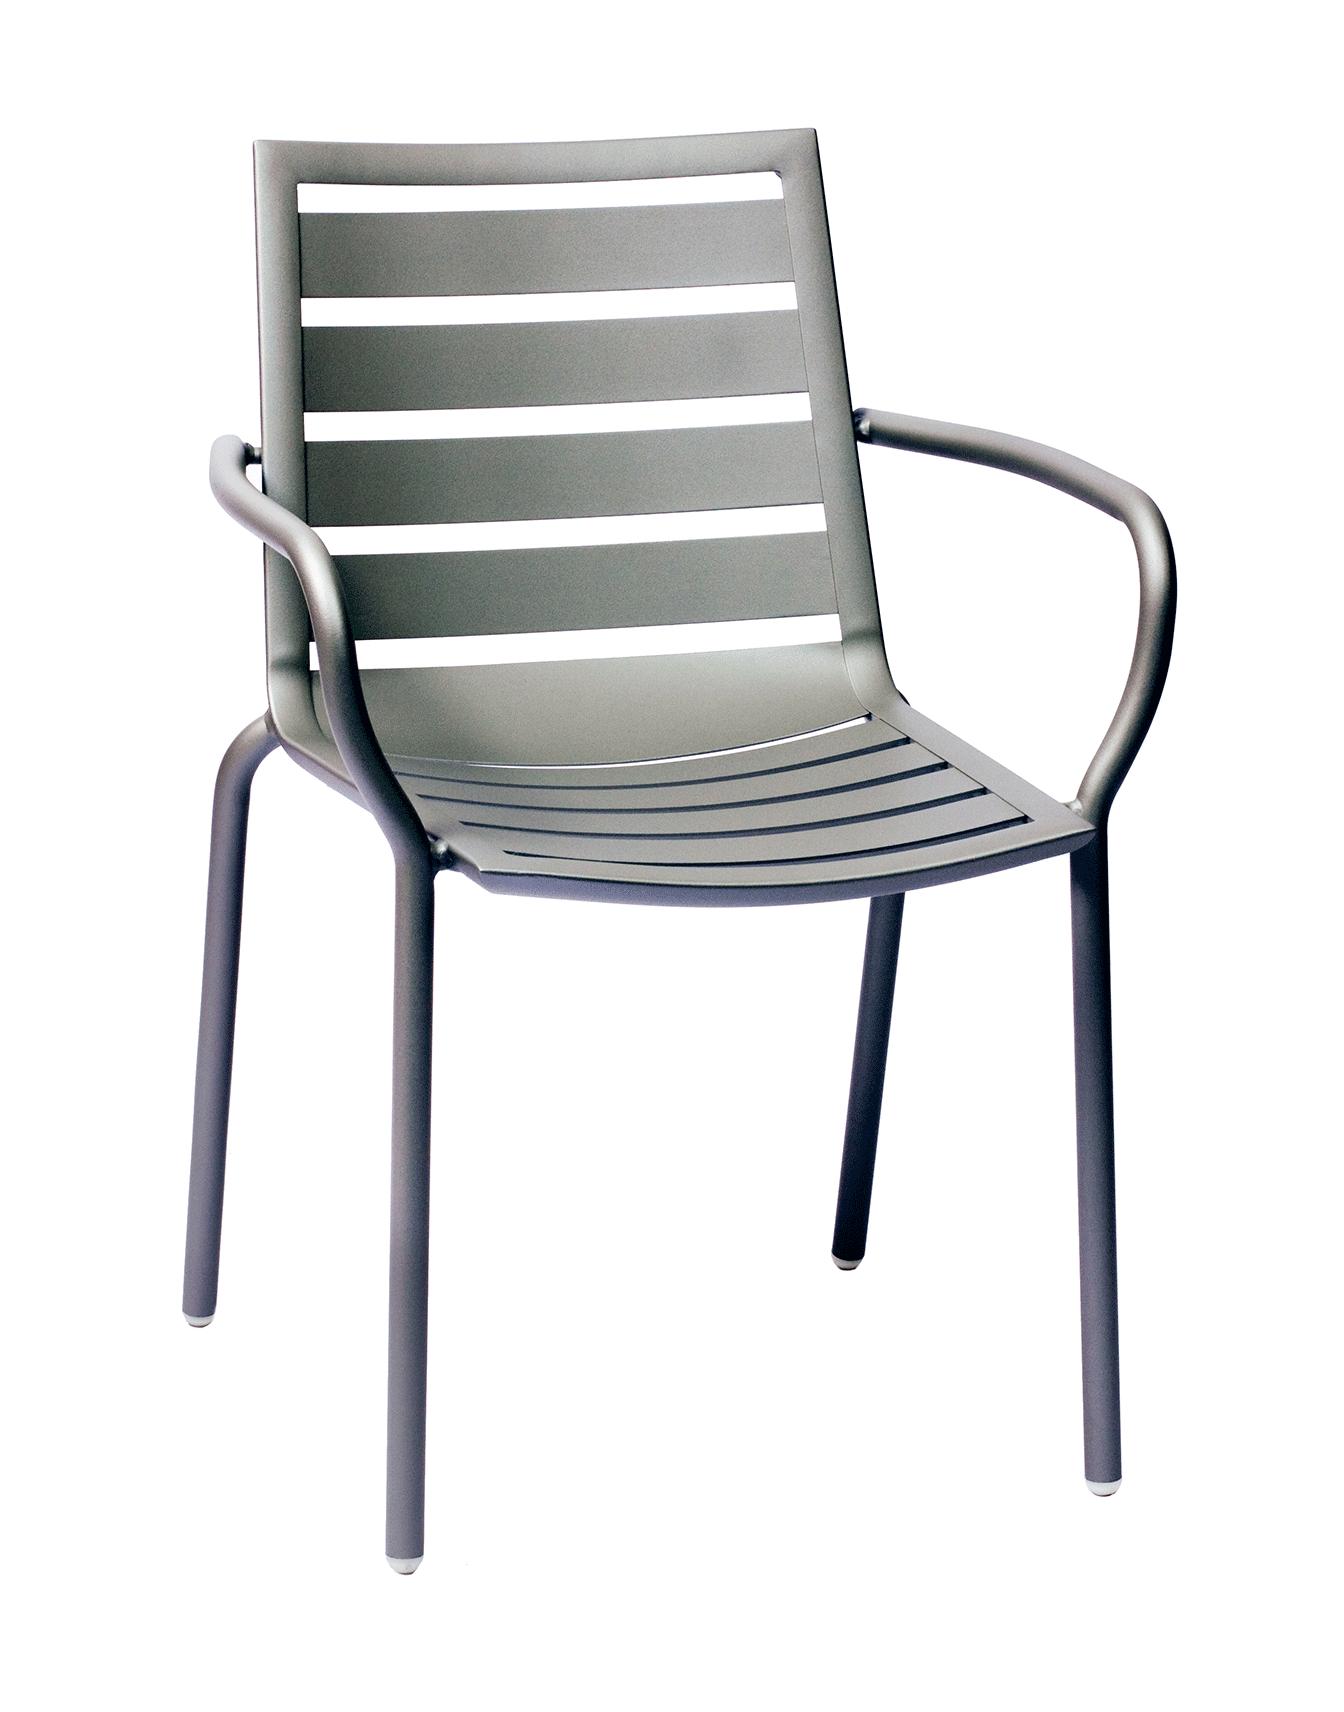 South Beach Outdoor Aluminum Restaurant Furniture